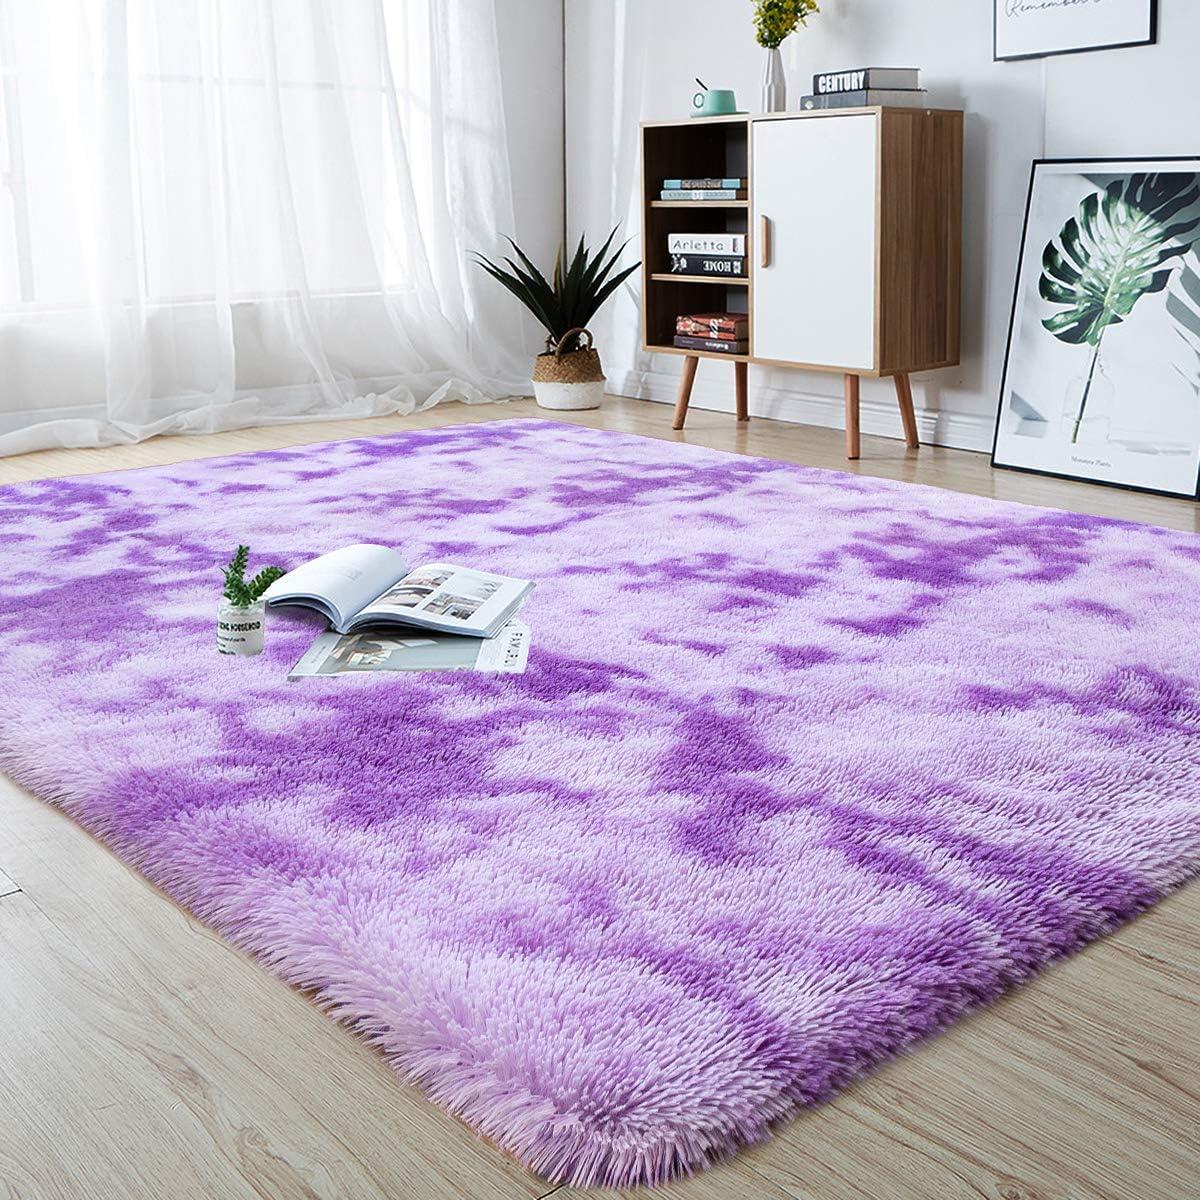 junovo Modern Abstract Shaggy Area Rugs Fluffy Soft Bedroom Rug for Kids Nursery Girls Boys Ultra Comfy Shag Fur Carpets Nursery Room Living Room Furry Decor Rugs, 4 ft x 6 ft, Purple